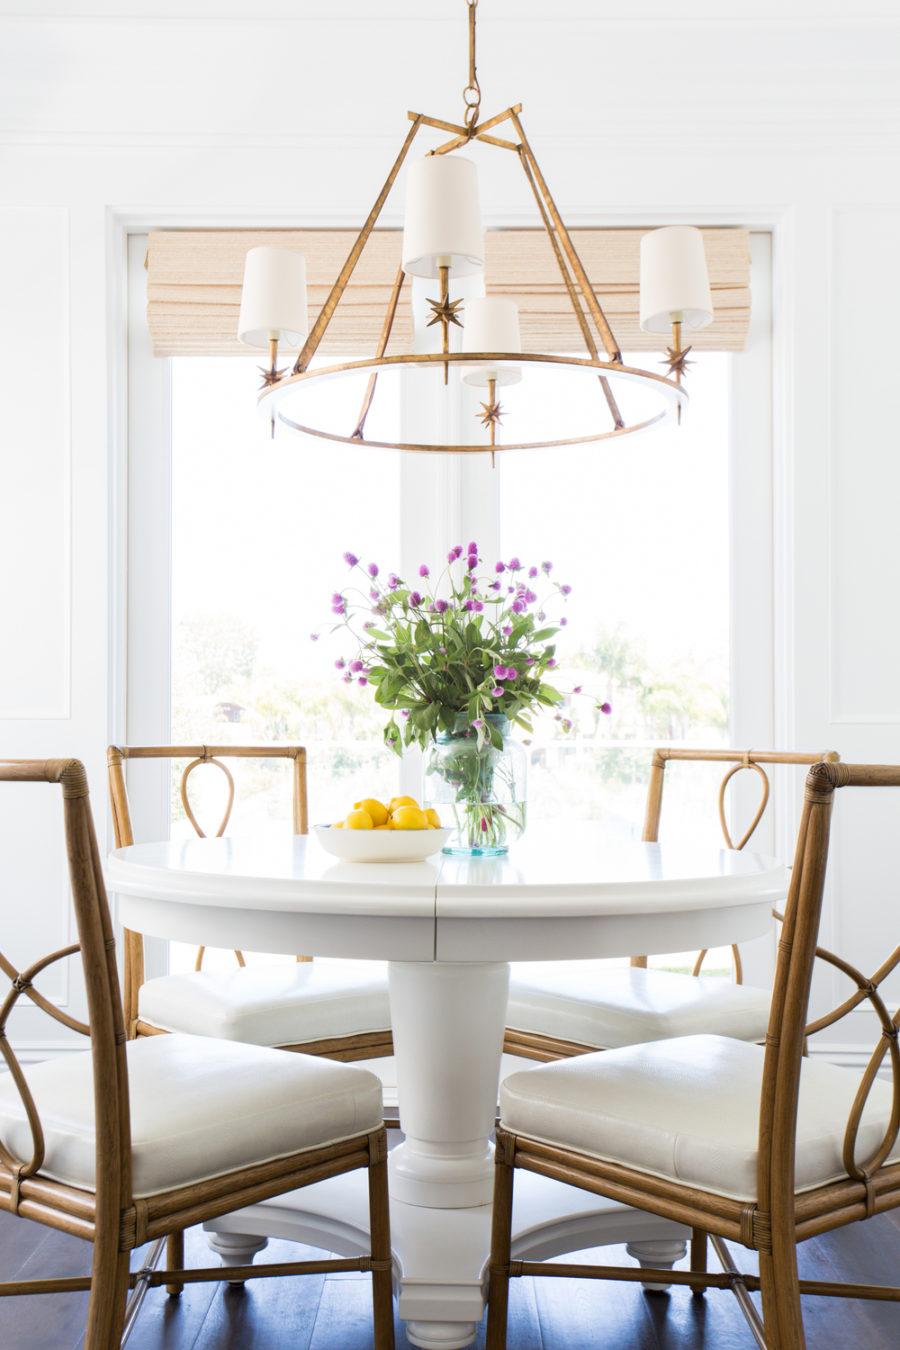 Small breakfast table area